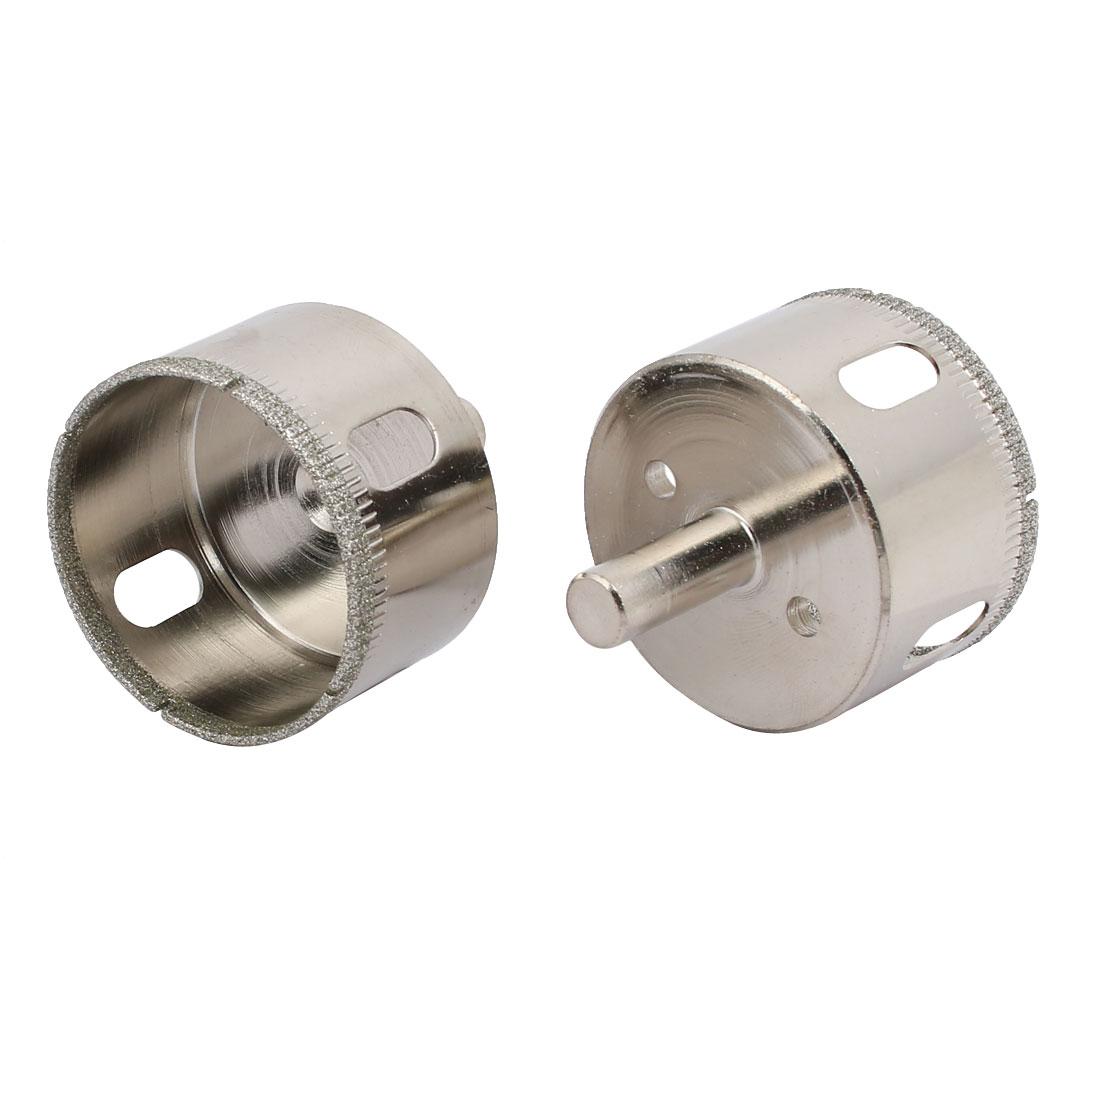 50mm Cutting Diameter Diamond Coated Drill Marble Glass Hole Saw 2pcs